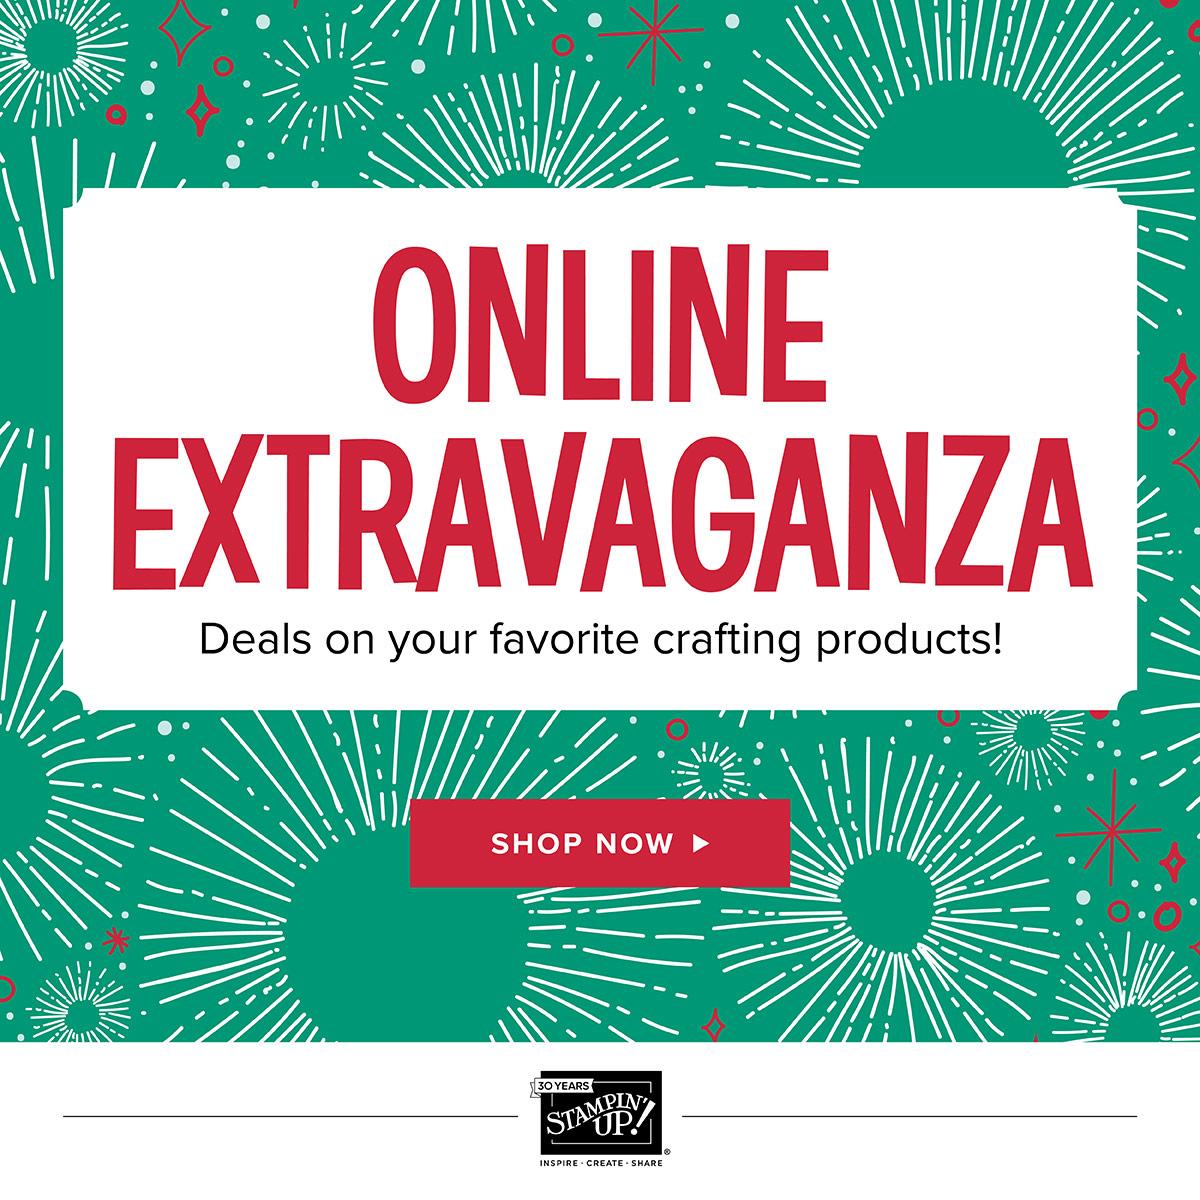 It's Stampin Up's Online Extravaganza!!